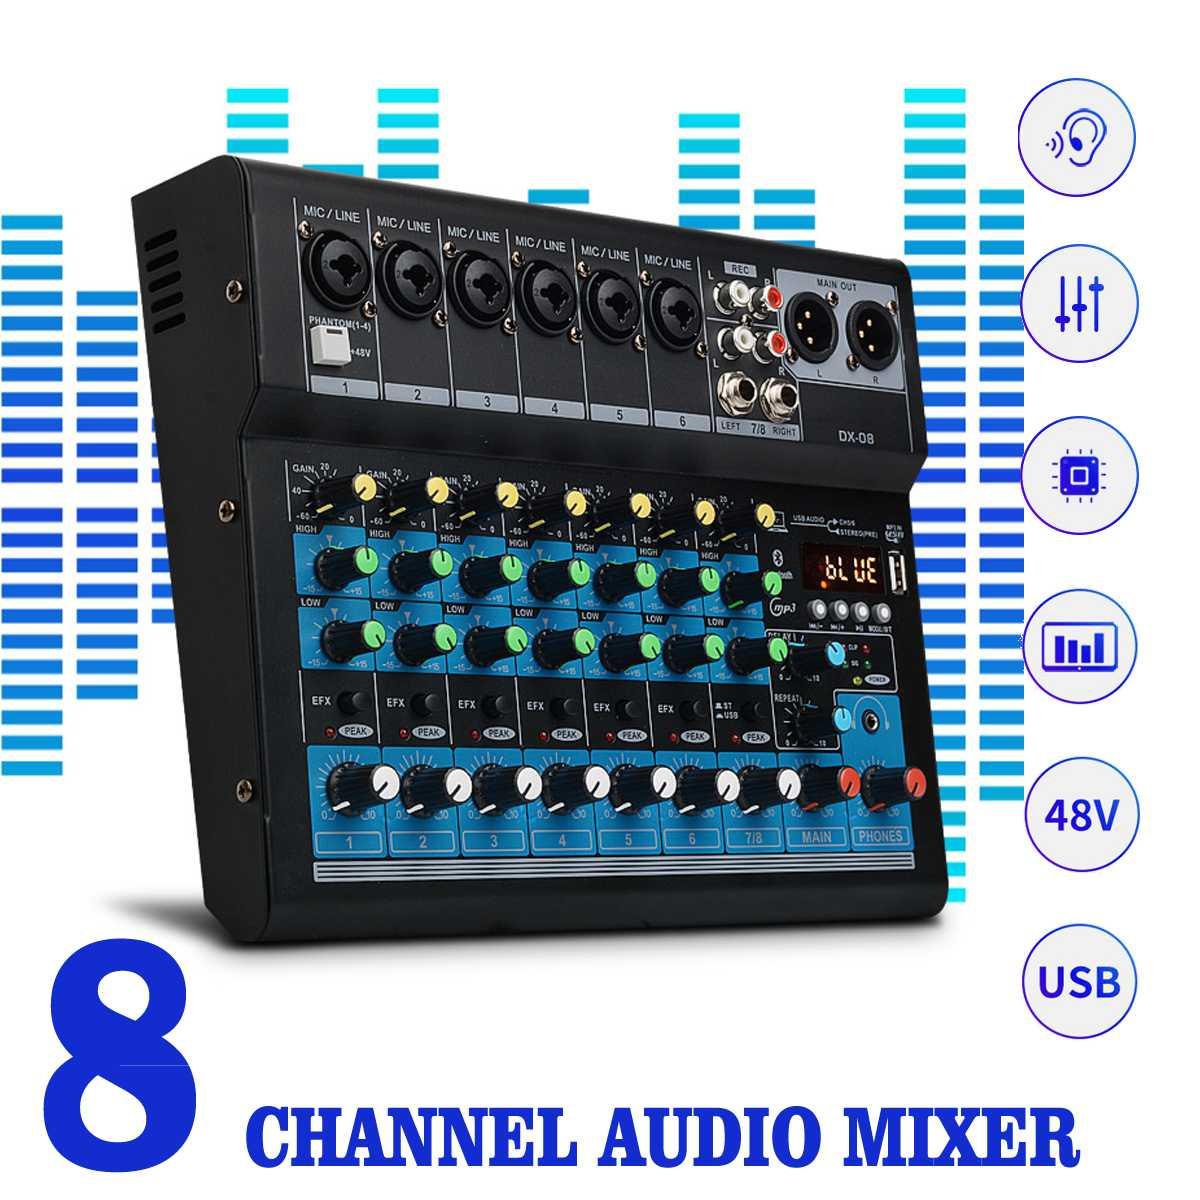 CLAITE 8 Kanal Sound-Mixer Konsole 48V Digitale Mikrofon Bluetooth Leistungsstarke Professionelle Karaoke Audio Mixer Verstärker